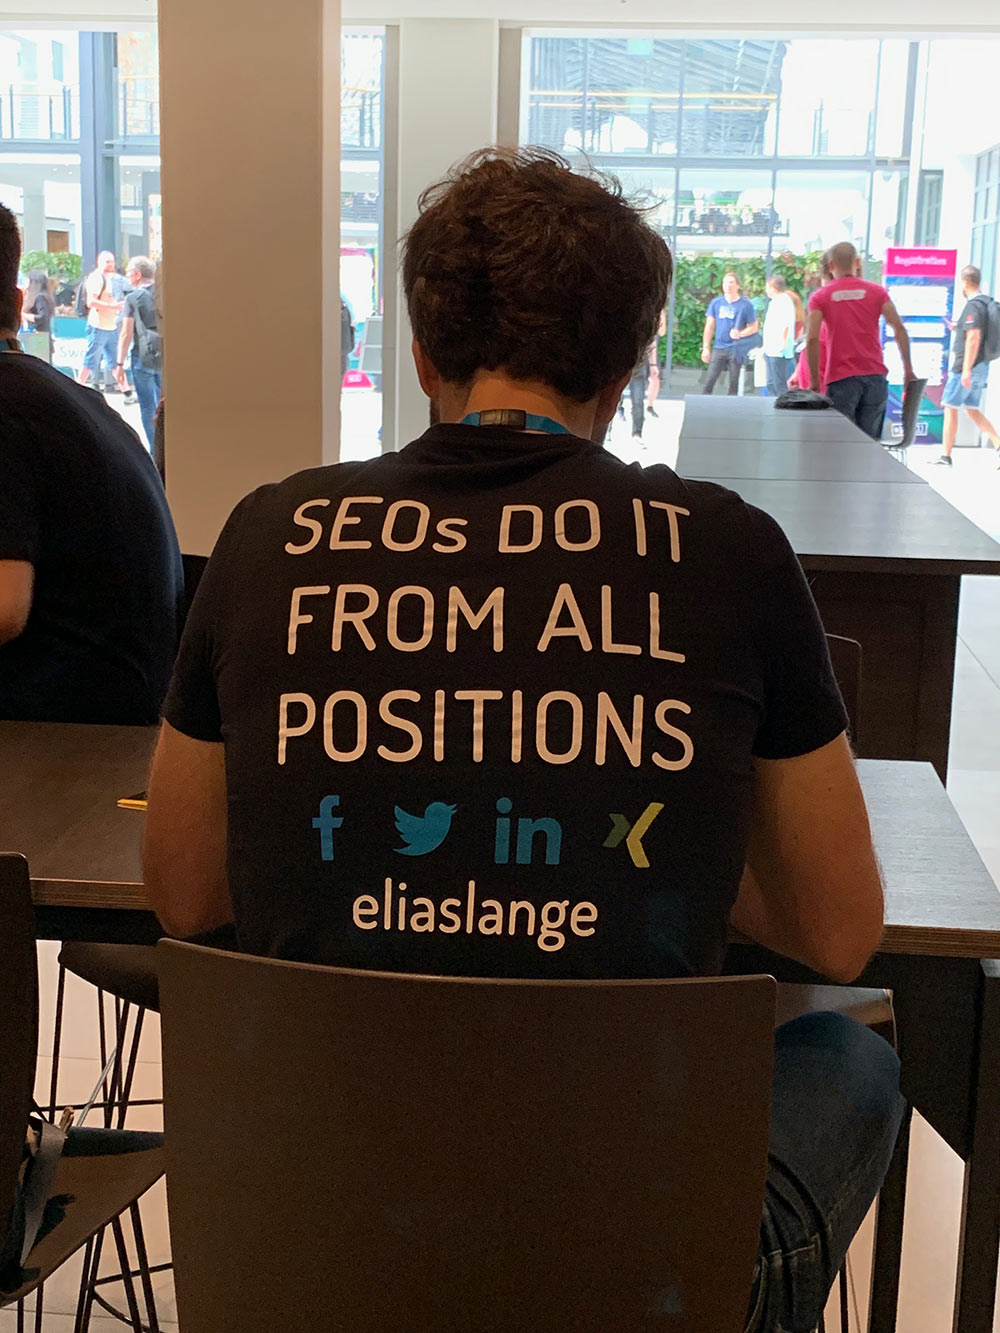 wceu 2019 day3 03 - WordCamp Europe 2019 - WordPress Konferenz – Tag 3 meines #InfluencerReisli